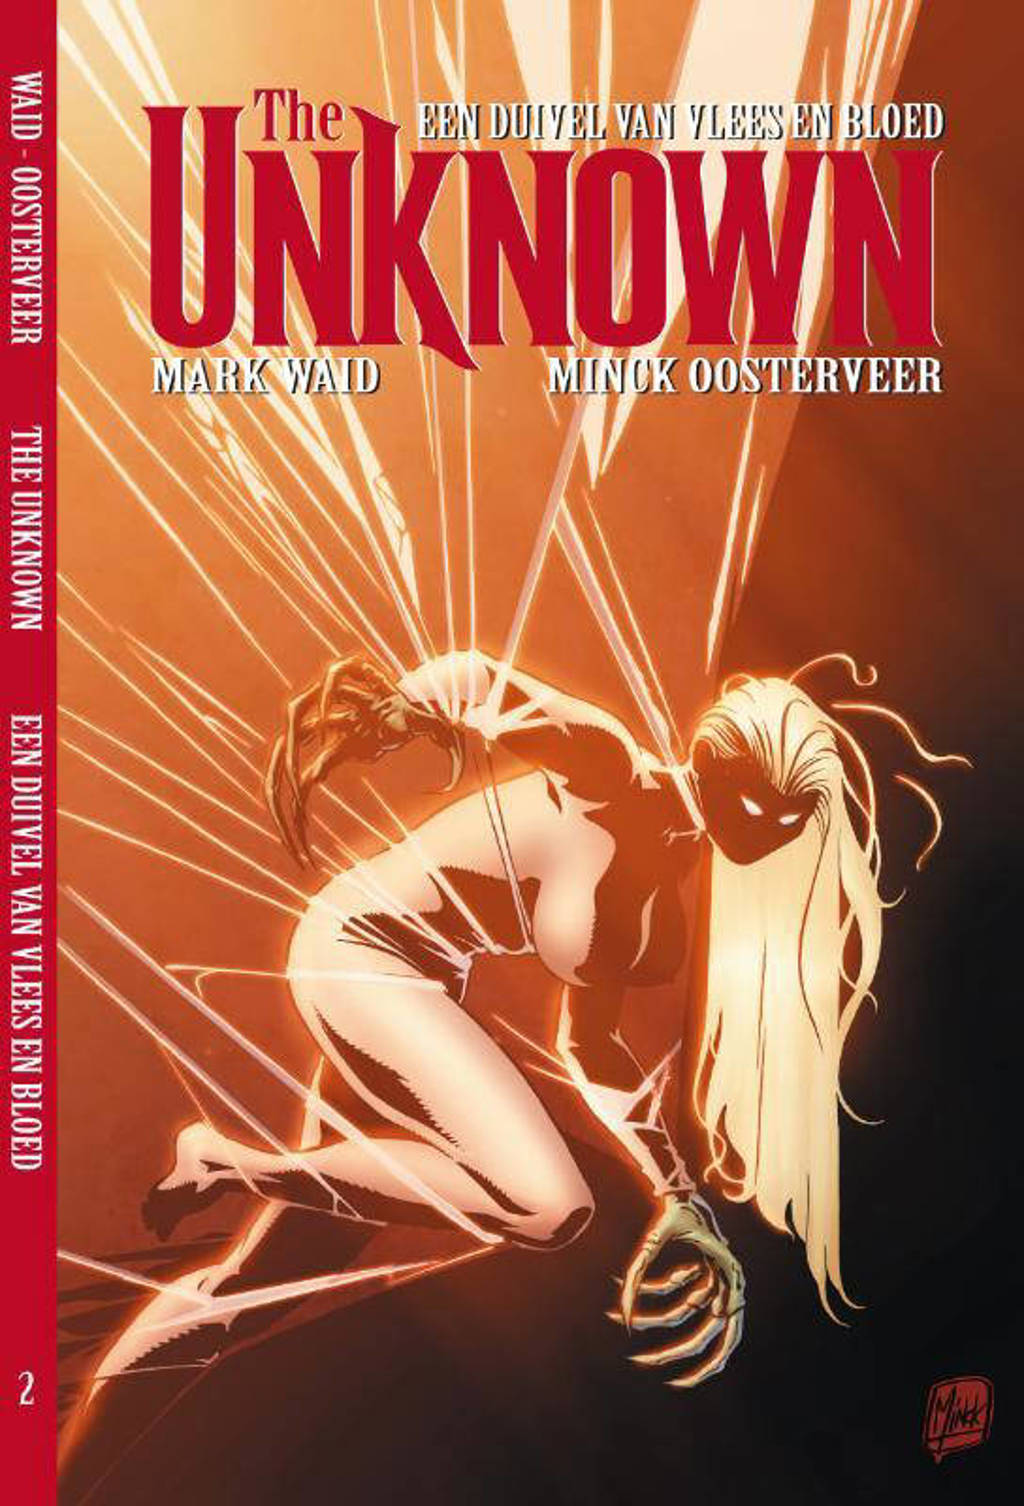 The Unknown: Een duivel van vlees en bloed - Mark Waid